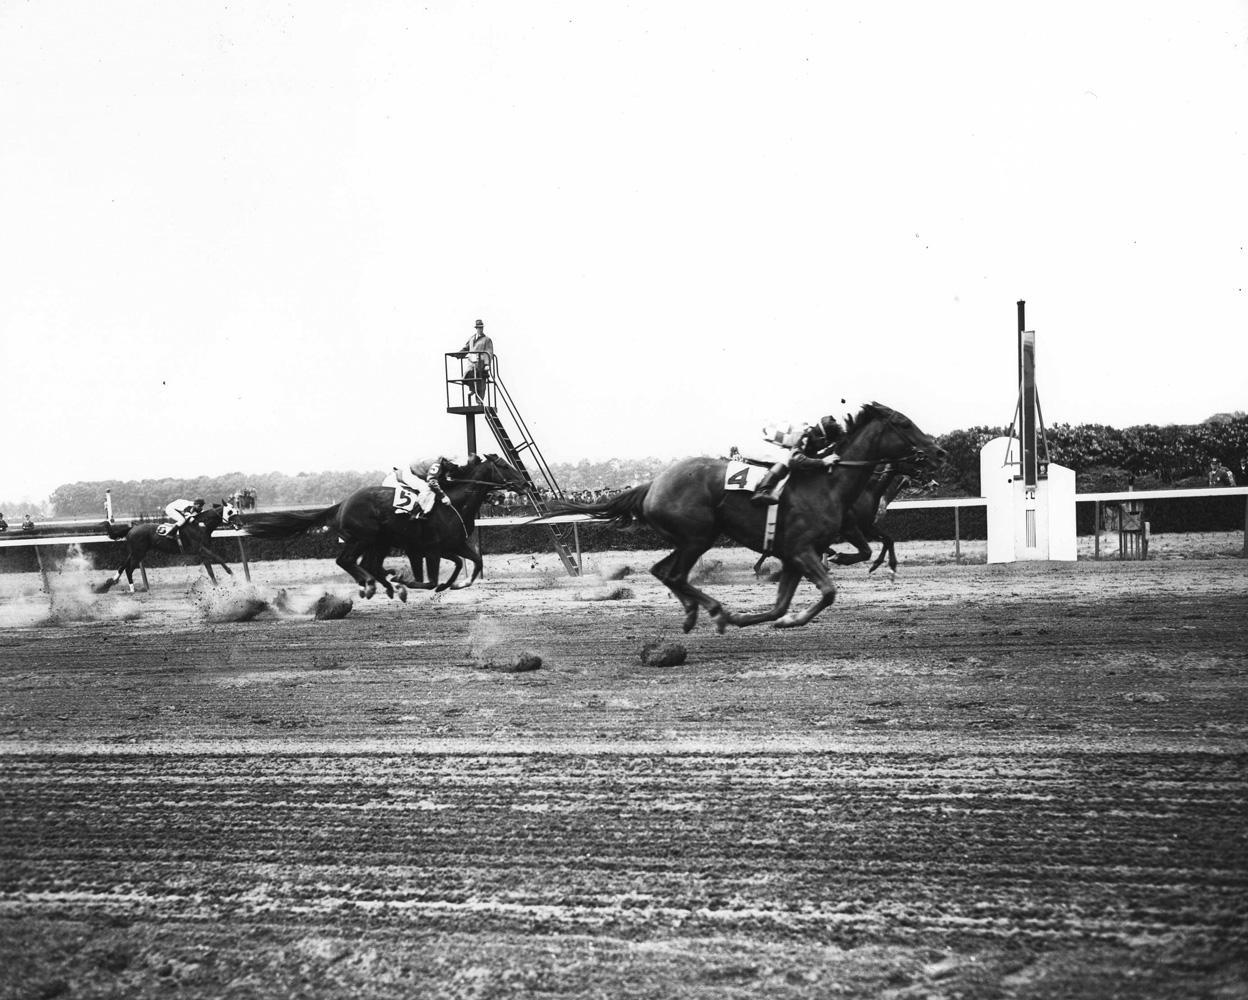 Gallorette (Job D. Jessop up) winning the 1946 Metropolitan Handicap at Belmont Park by a nose (Keeneland Library Morgan Collection/Museum Collection)